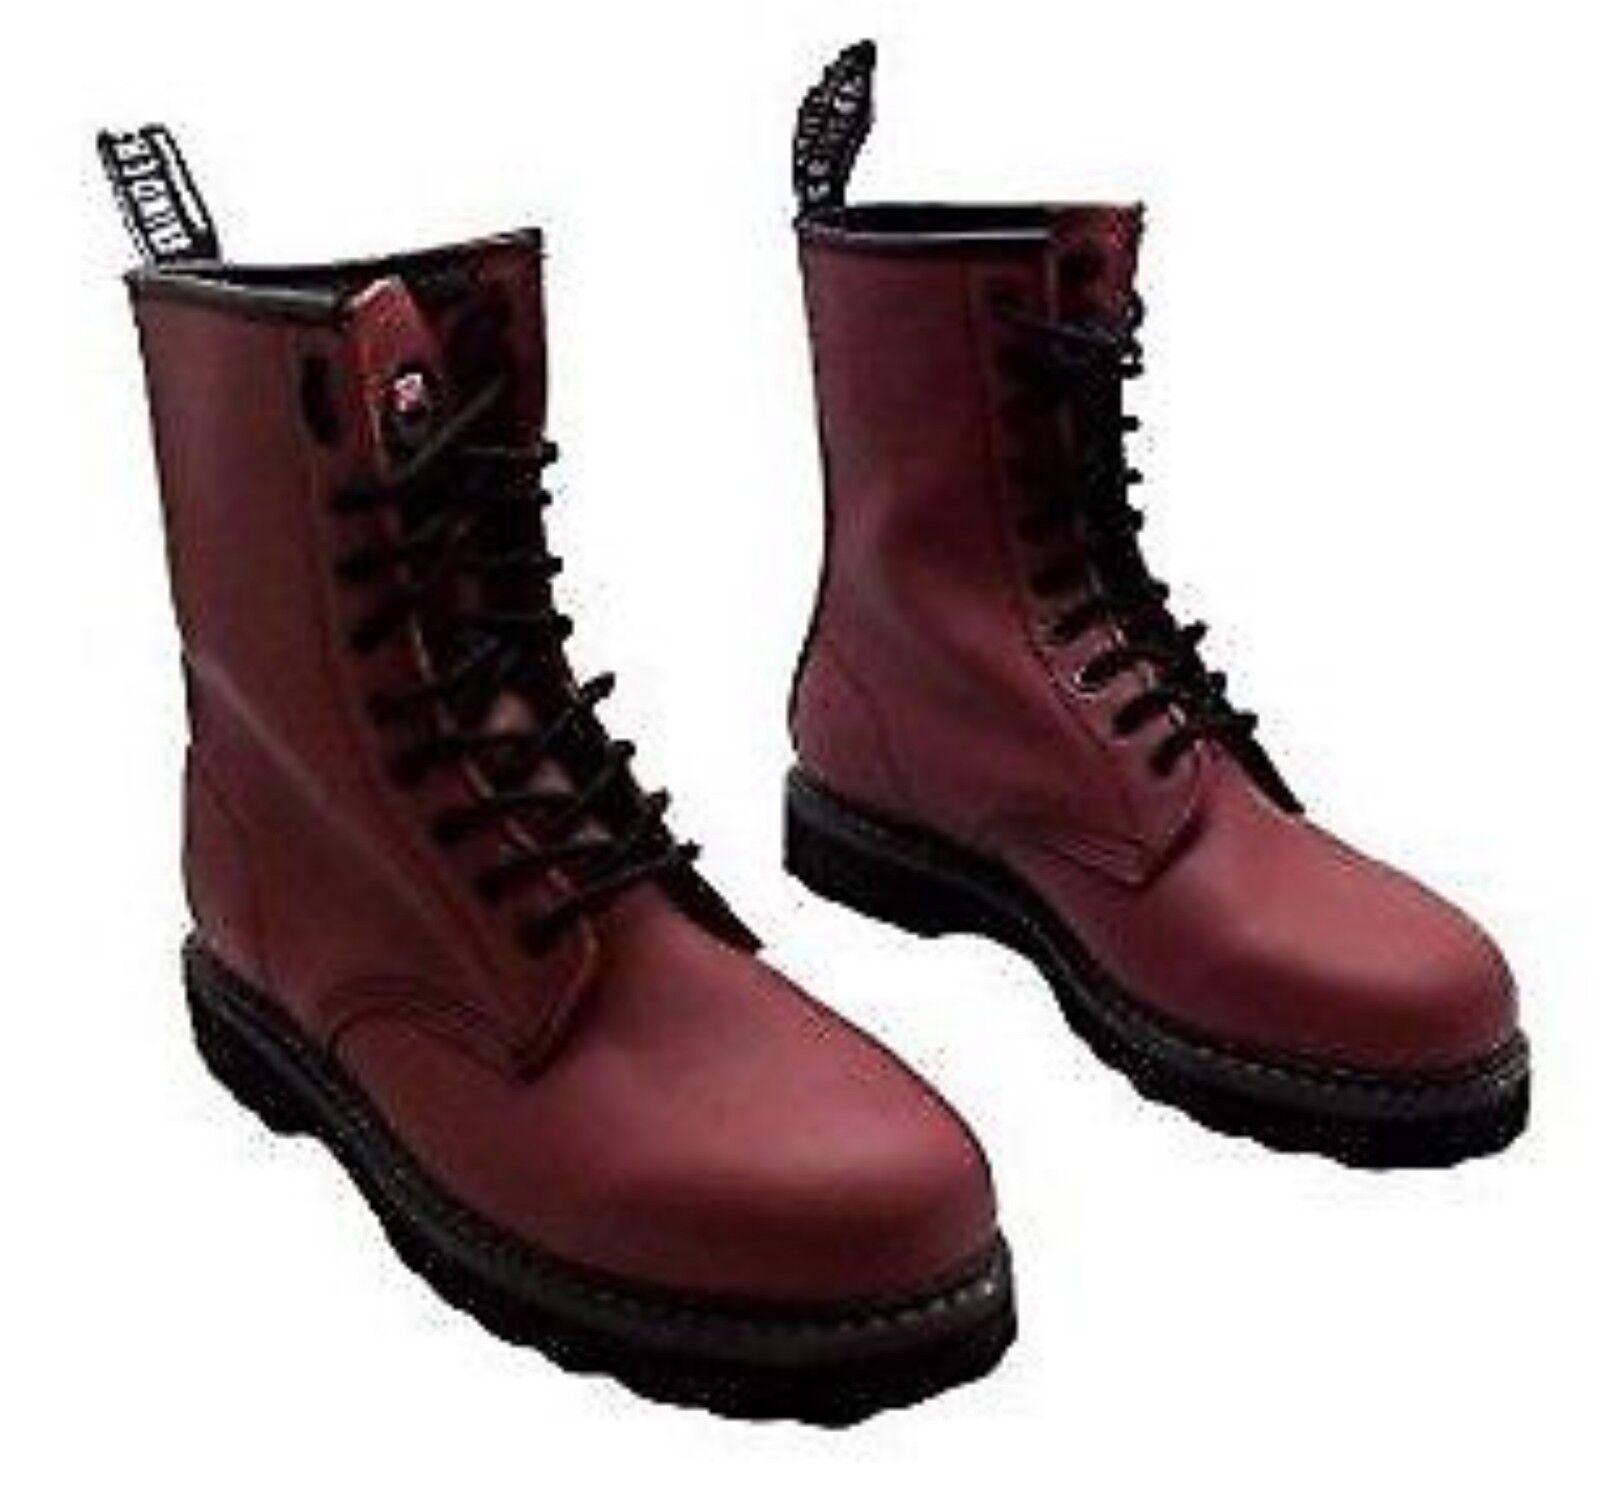 Grinders Albert ROT Cherry Leder Combat Stiefel 8 Eyelet  Derby Boot Punk